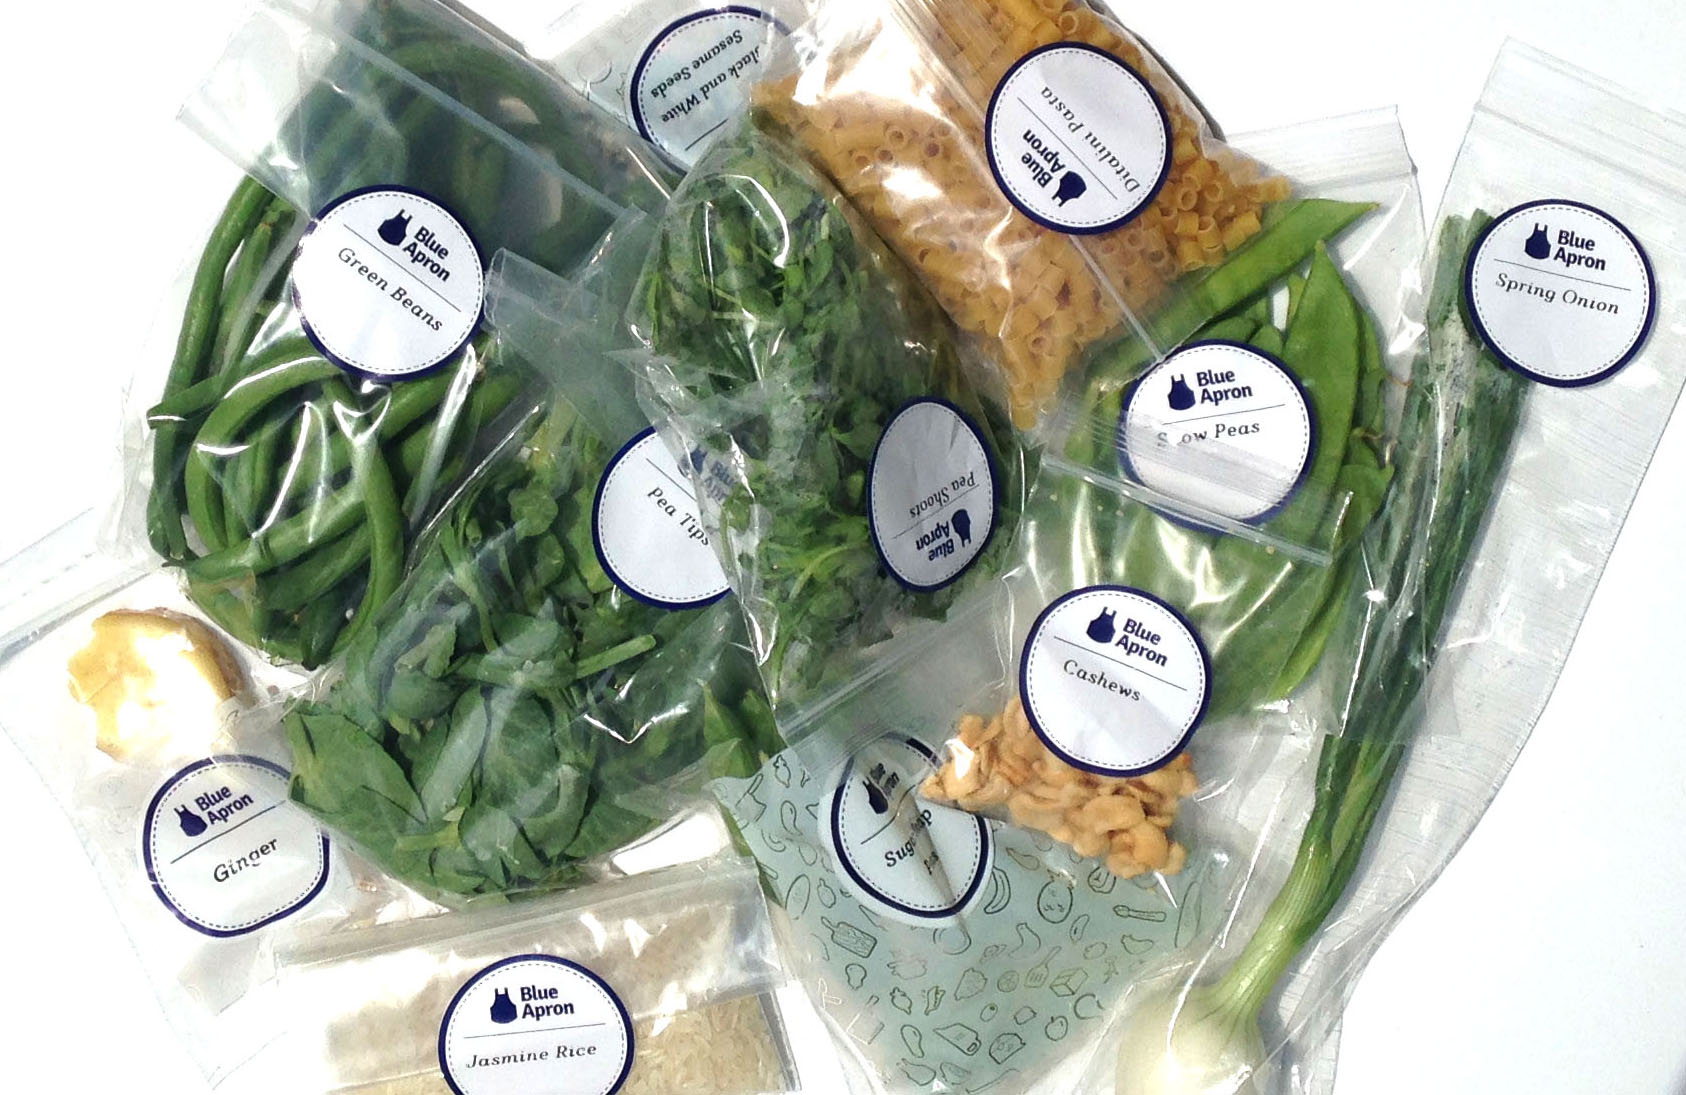 Blue Apron ingredients in bags.